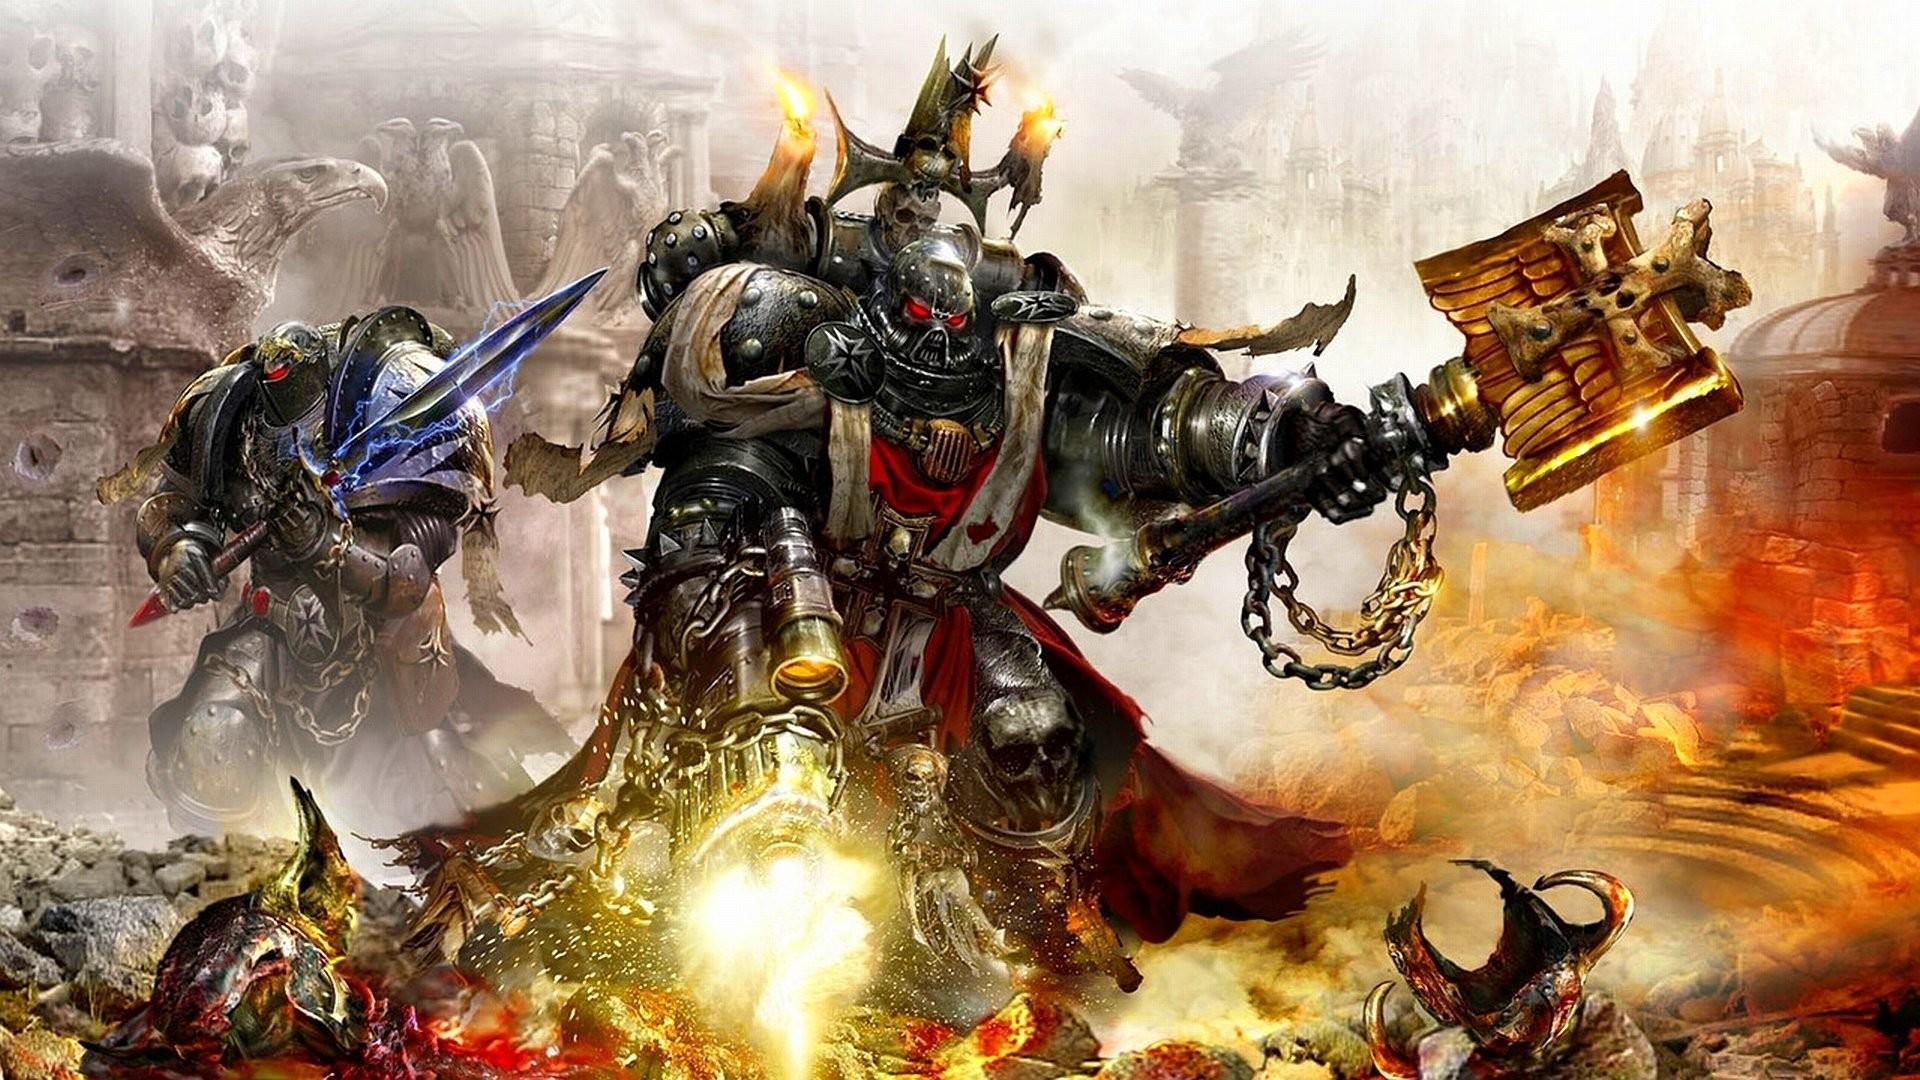 Video Game – Warhammer 40K Warhammer Wallpaper